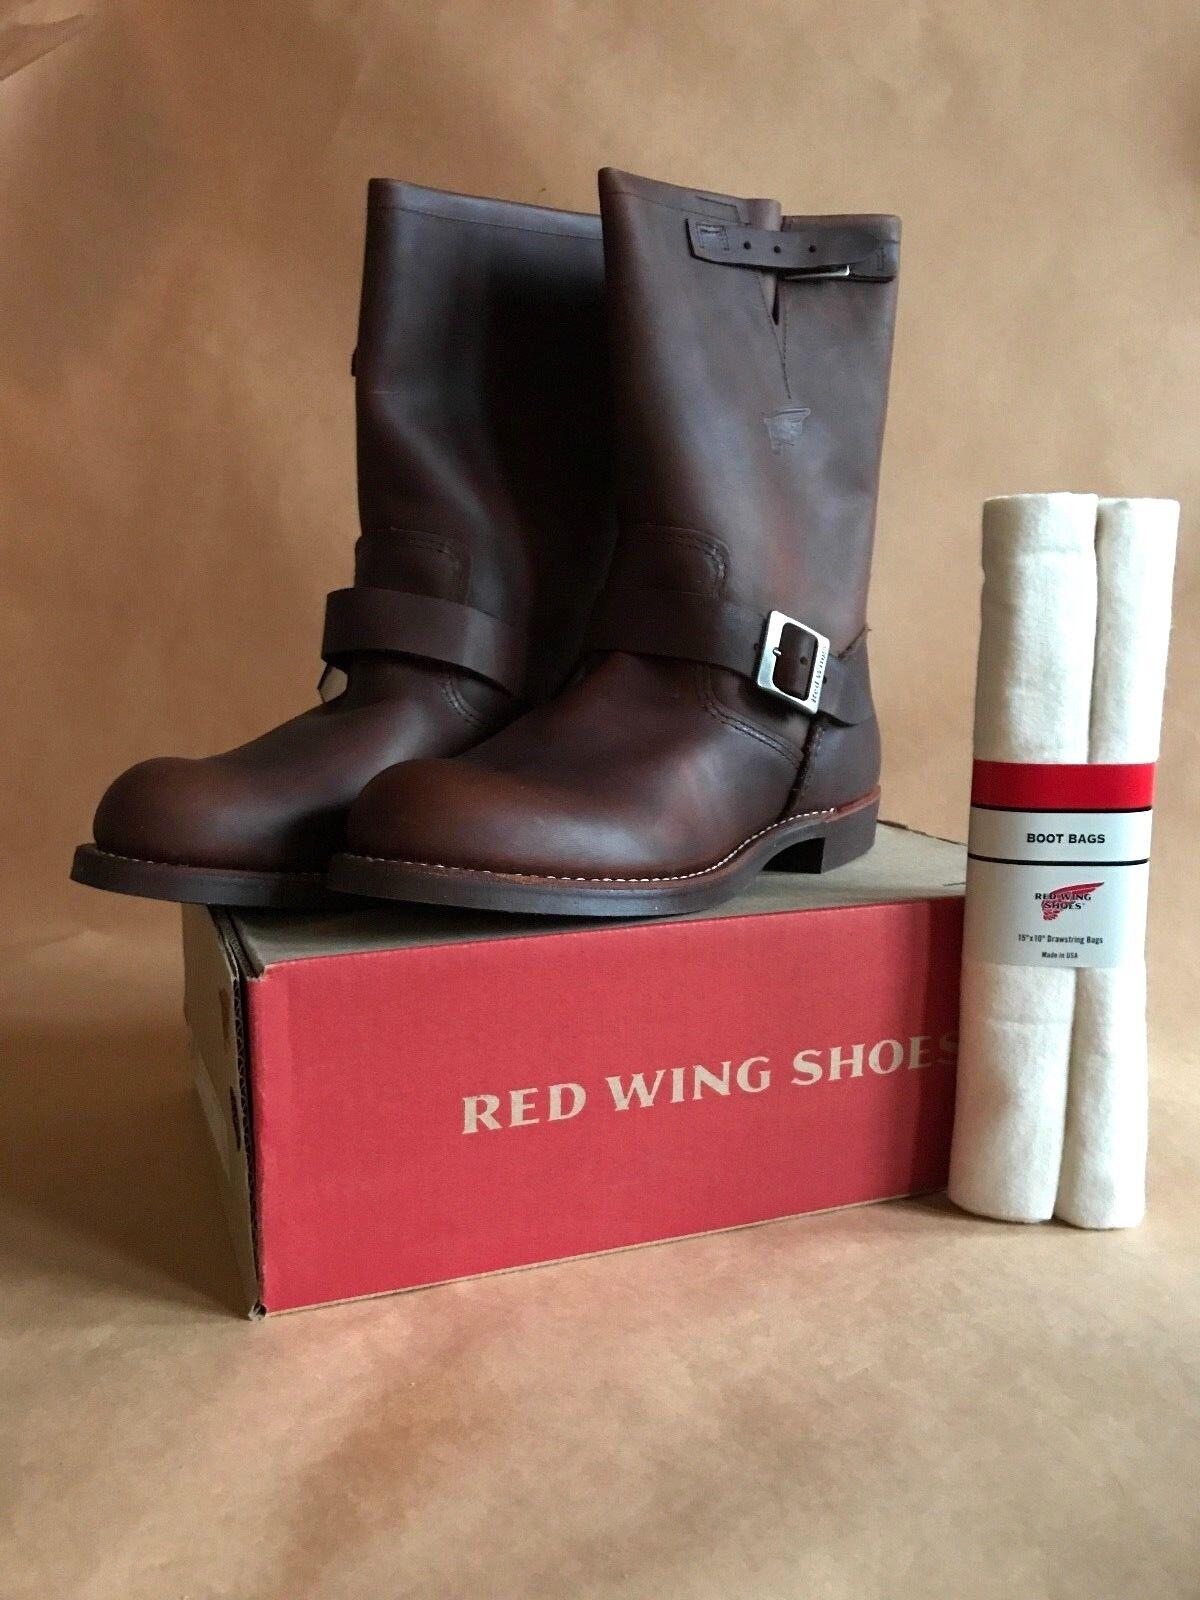 rot Wing schuhe 2991 D Engineer mit Schuhbeutel